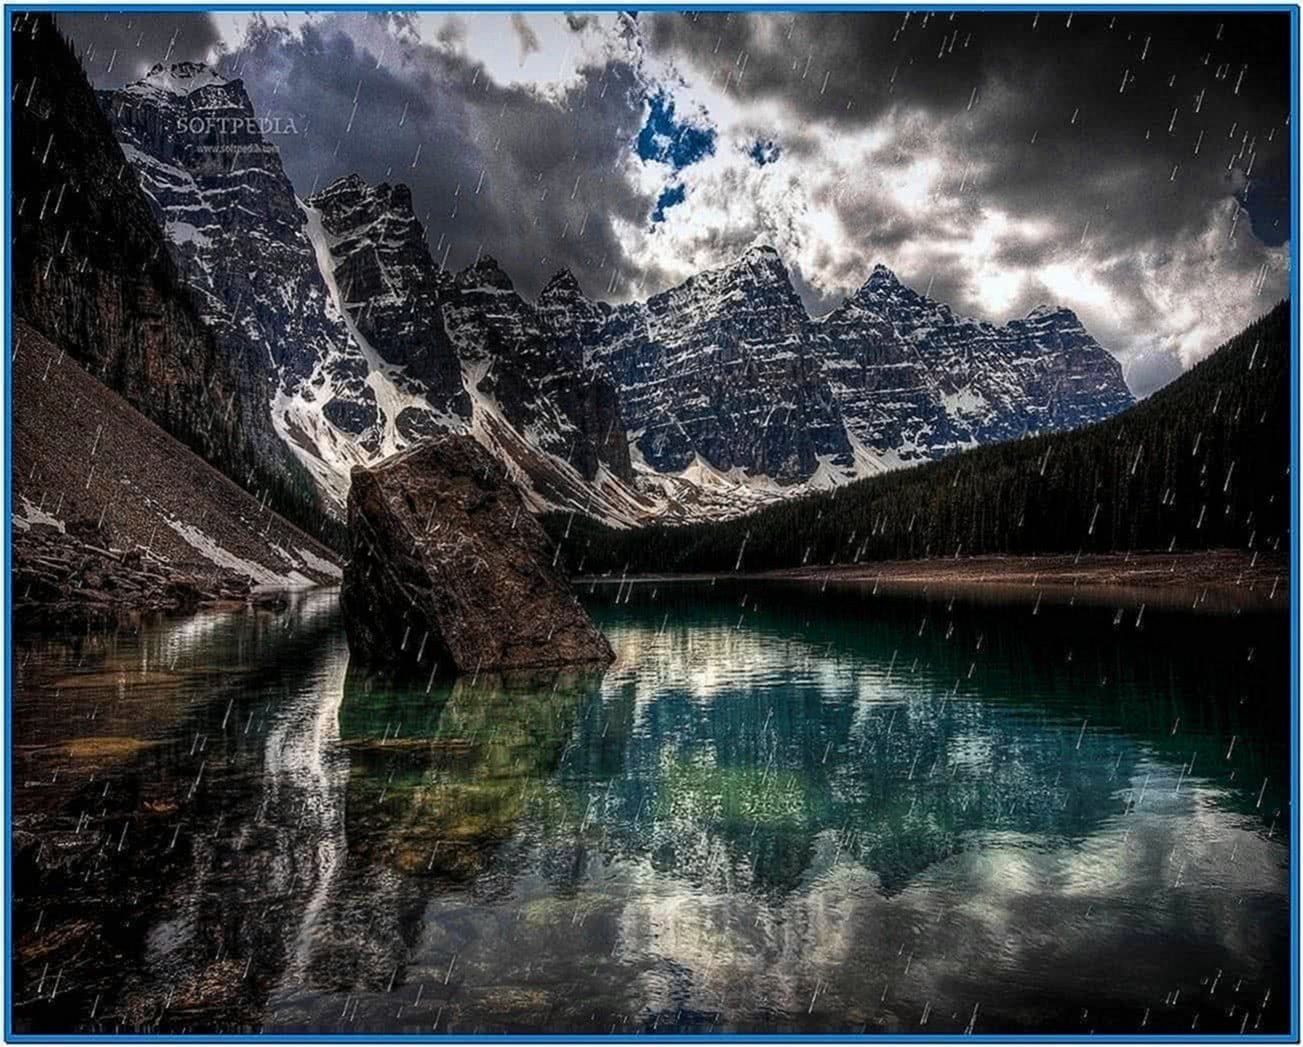 mountain rainstorm screensaver download free